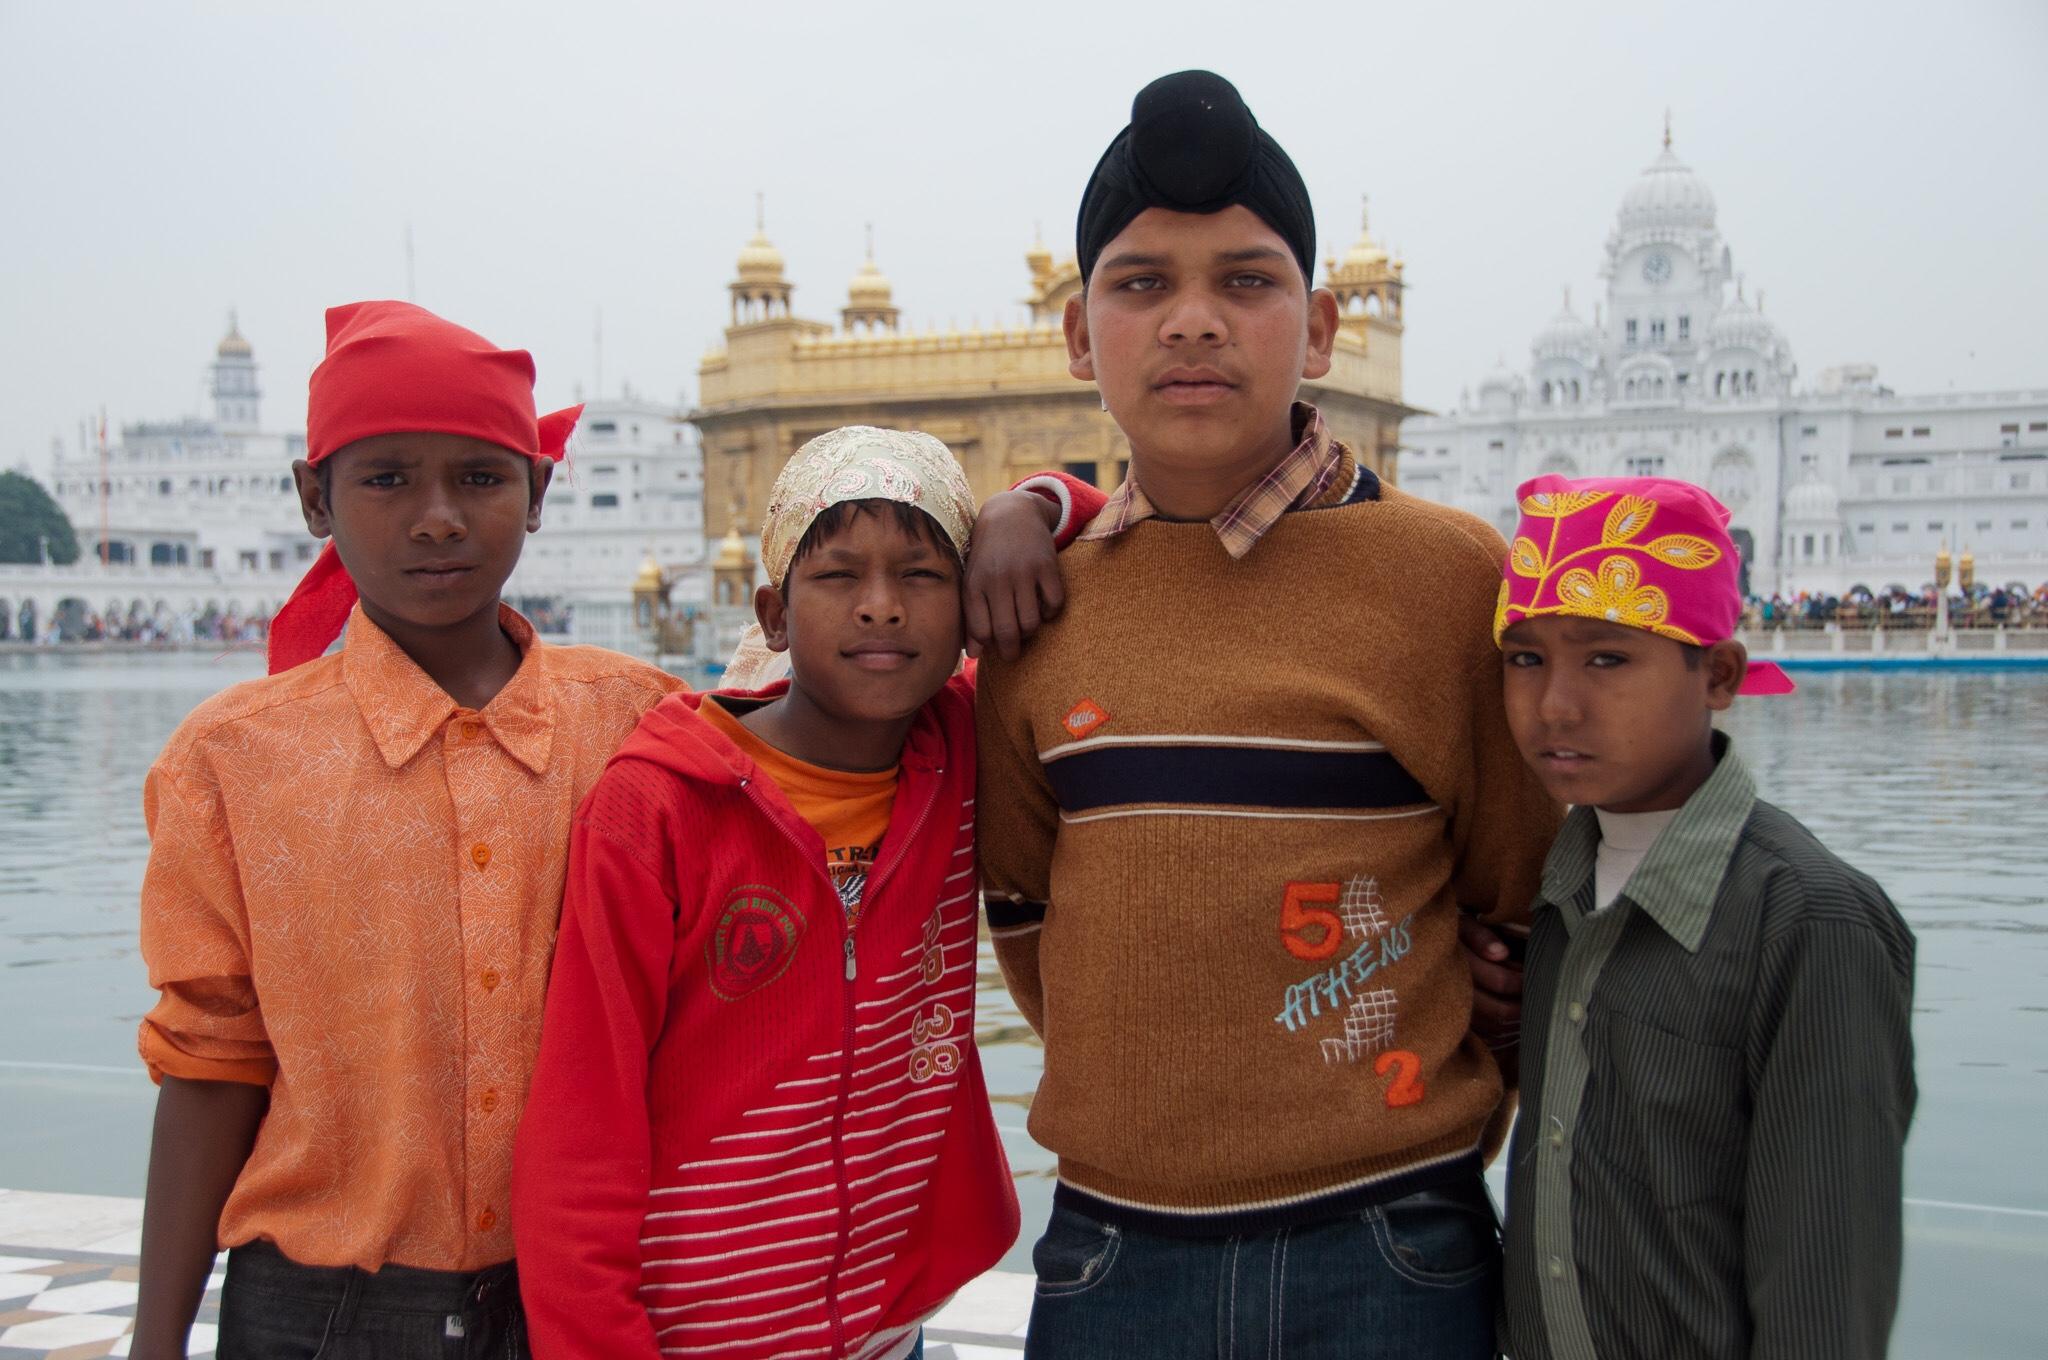 Golden Temple Gurdwara, Amritsar, India, 2011